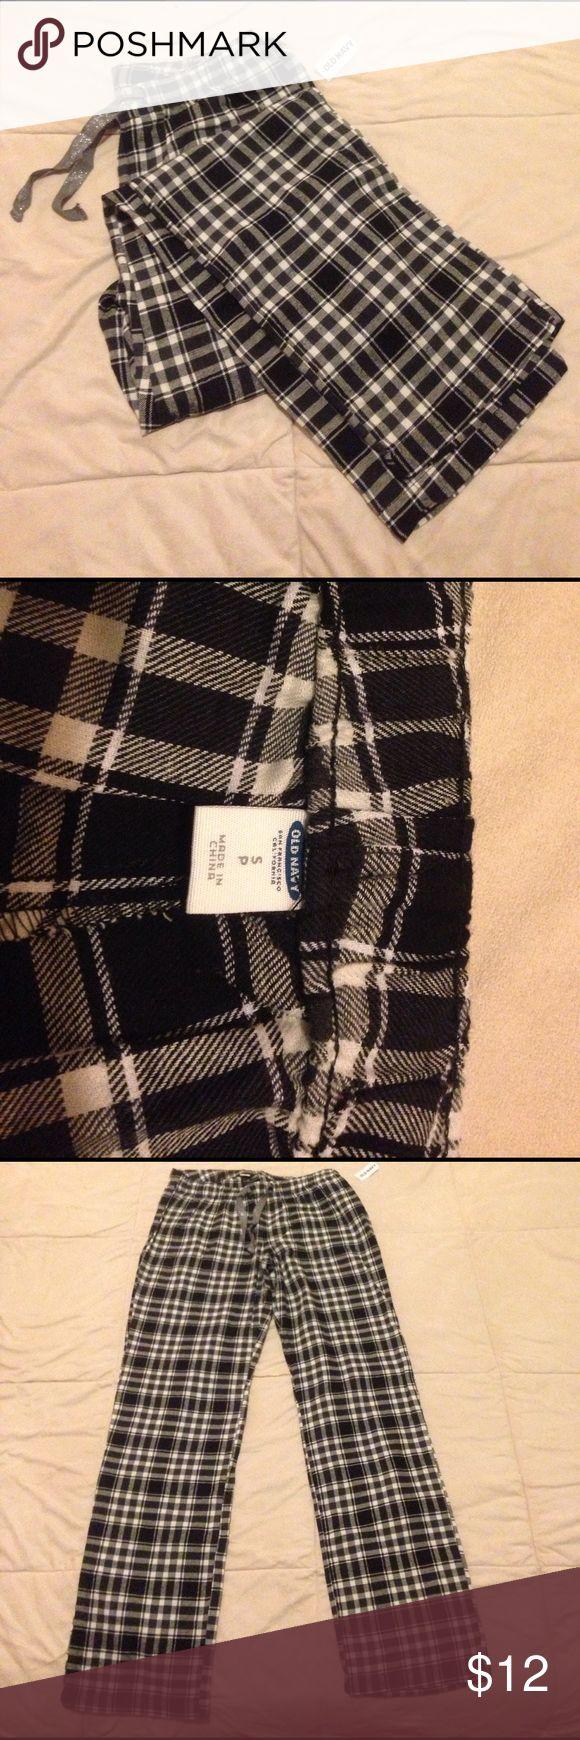 Old Navy Flannel Pajama Pants Brand new Old Navy flannel pajama pants with tags. Soft and cozy. Old Navy Intimates & Sleepwear Pajamas